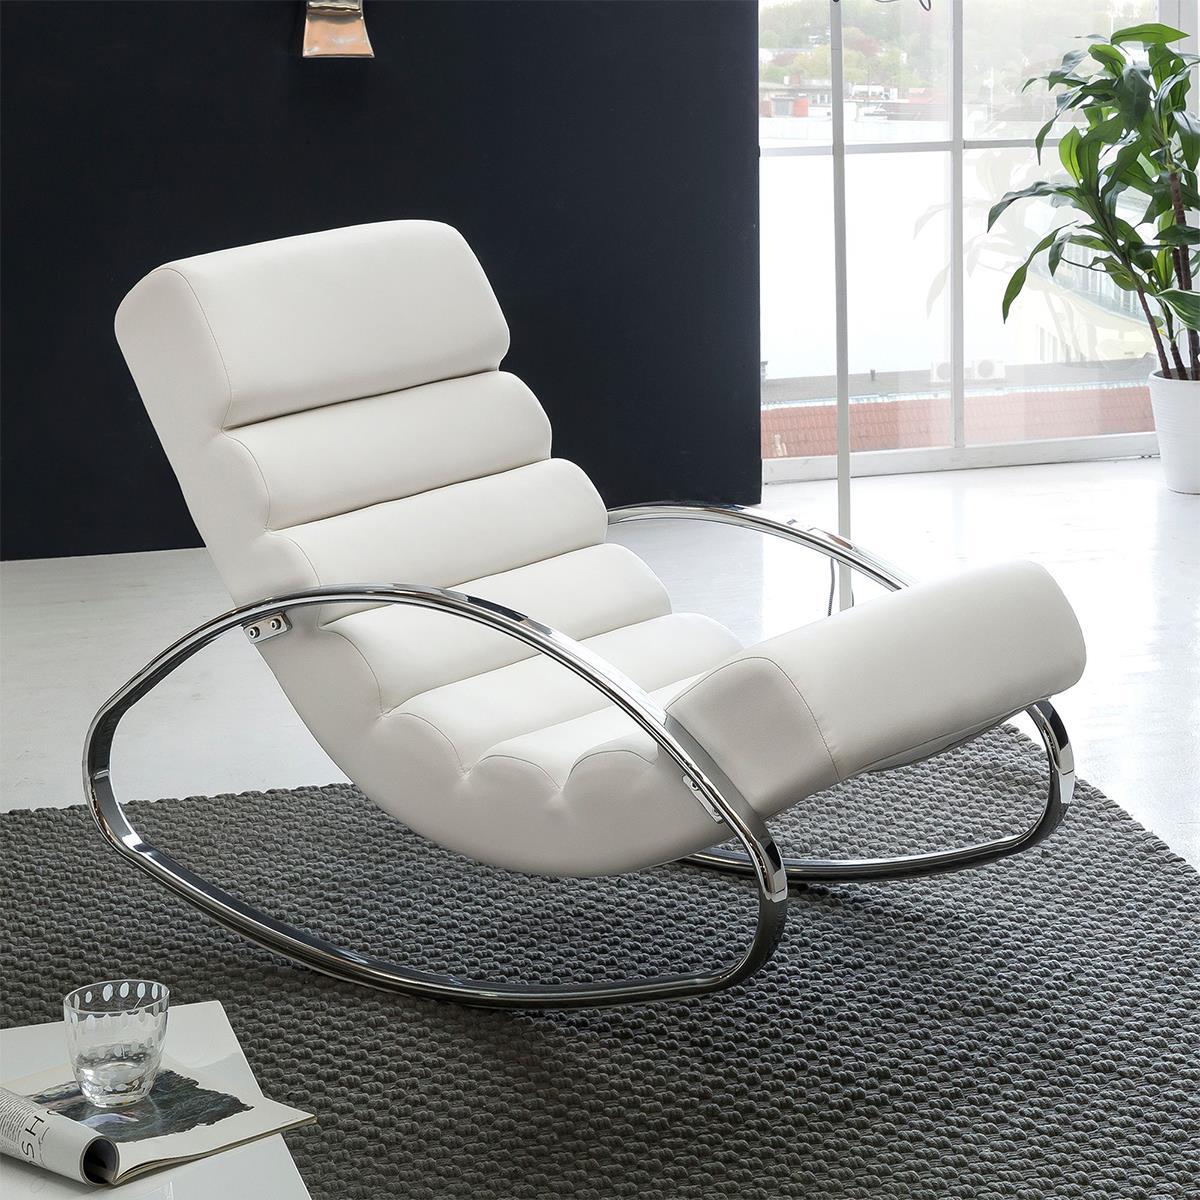 Relax Fauteuil Design.Fauteuil Relax Martina Design Exclusif En Cuir Blanc Chaisepro Fr